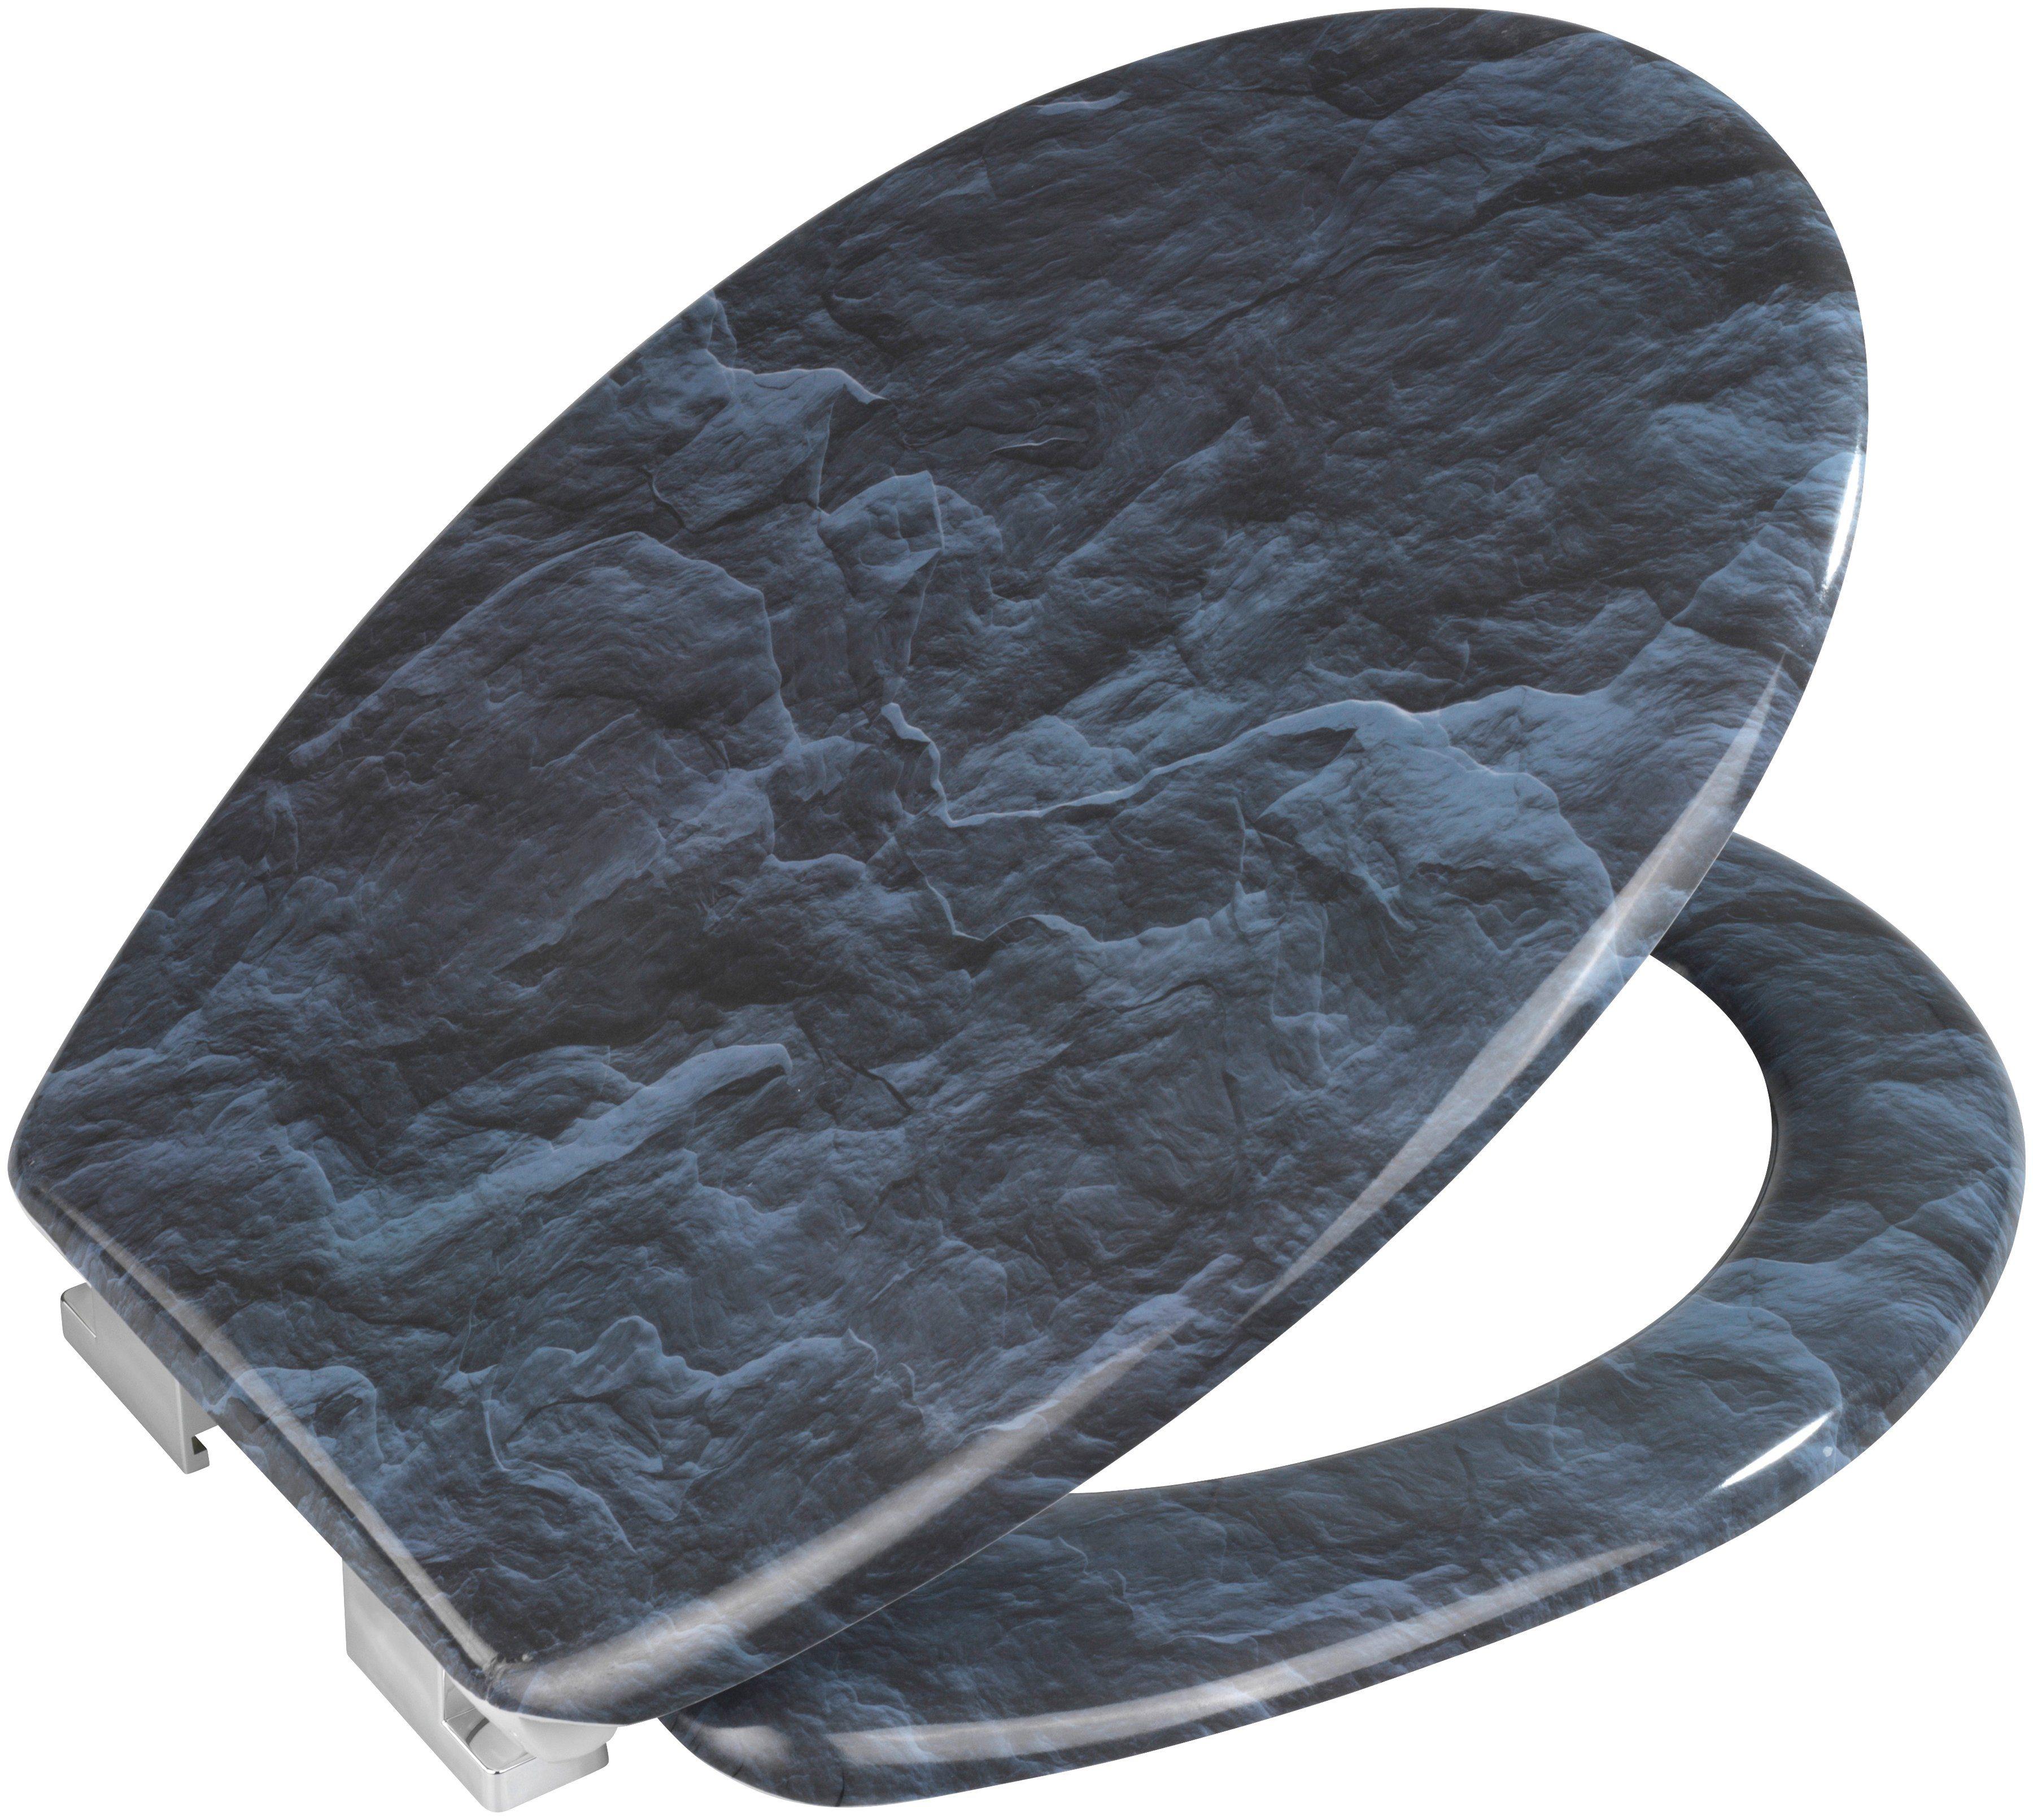 WC-Sitz »Slate Rock«, Mit Absenkautomatik